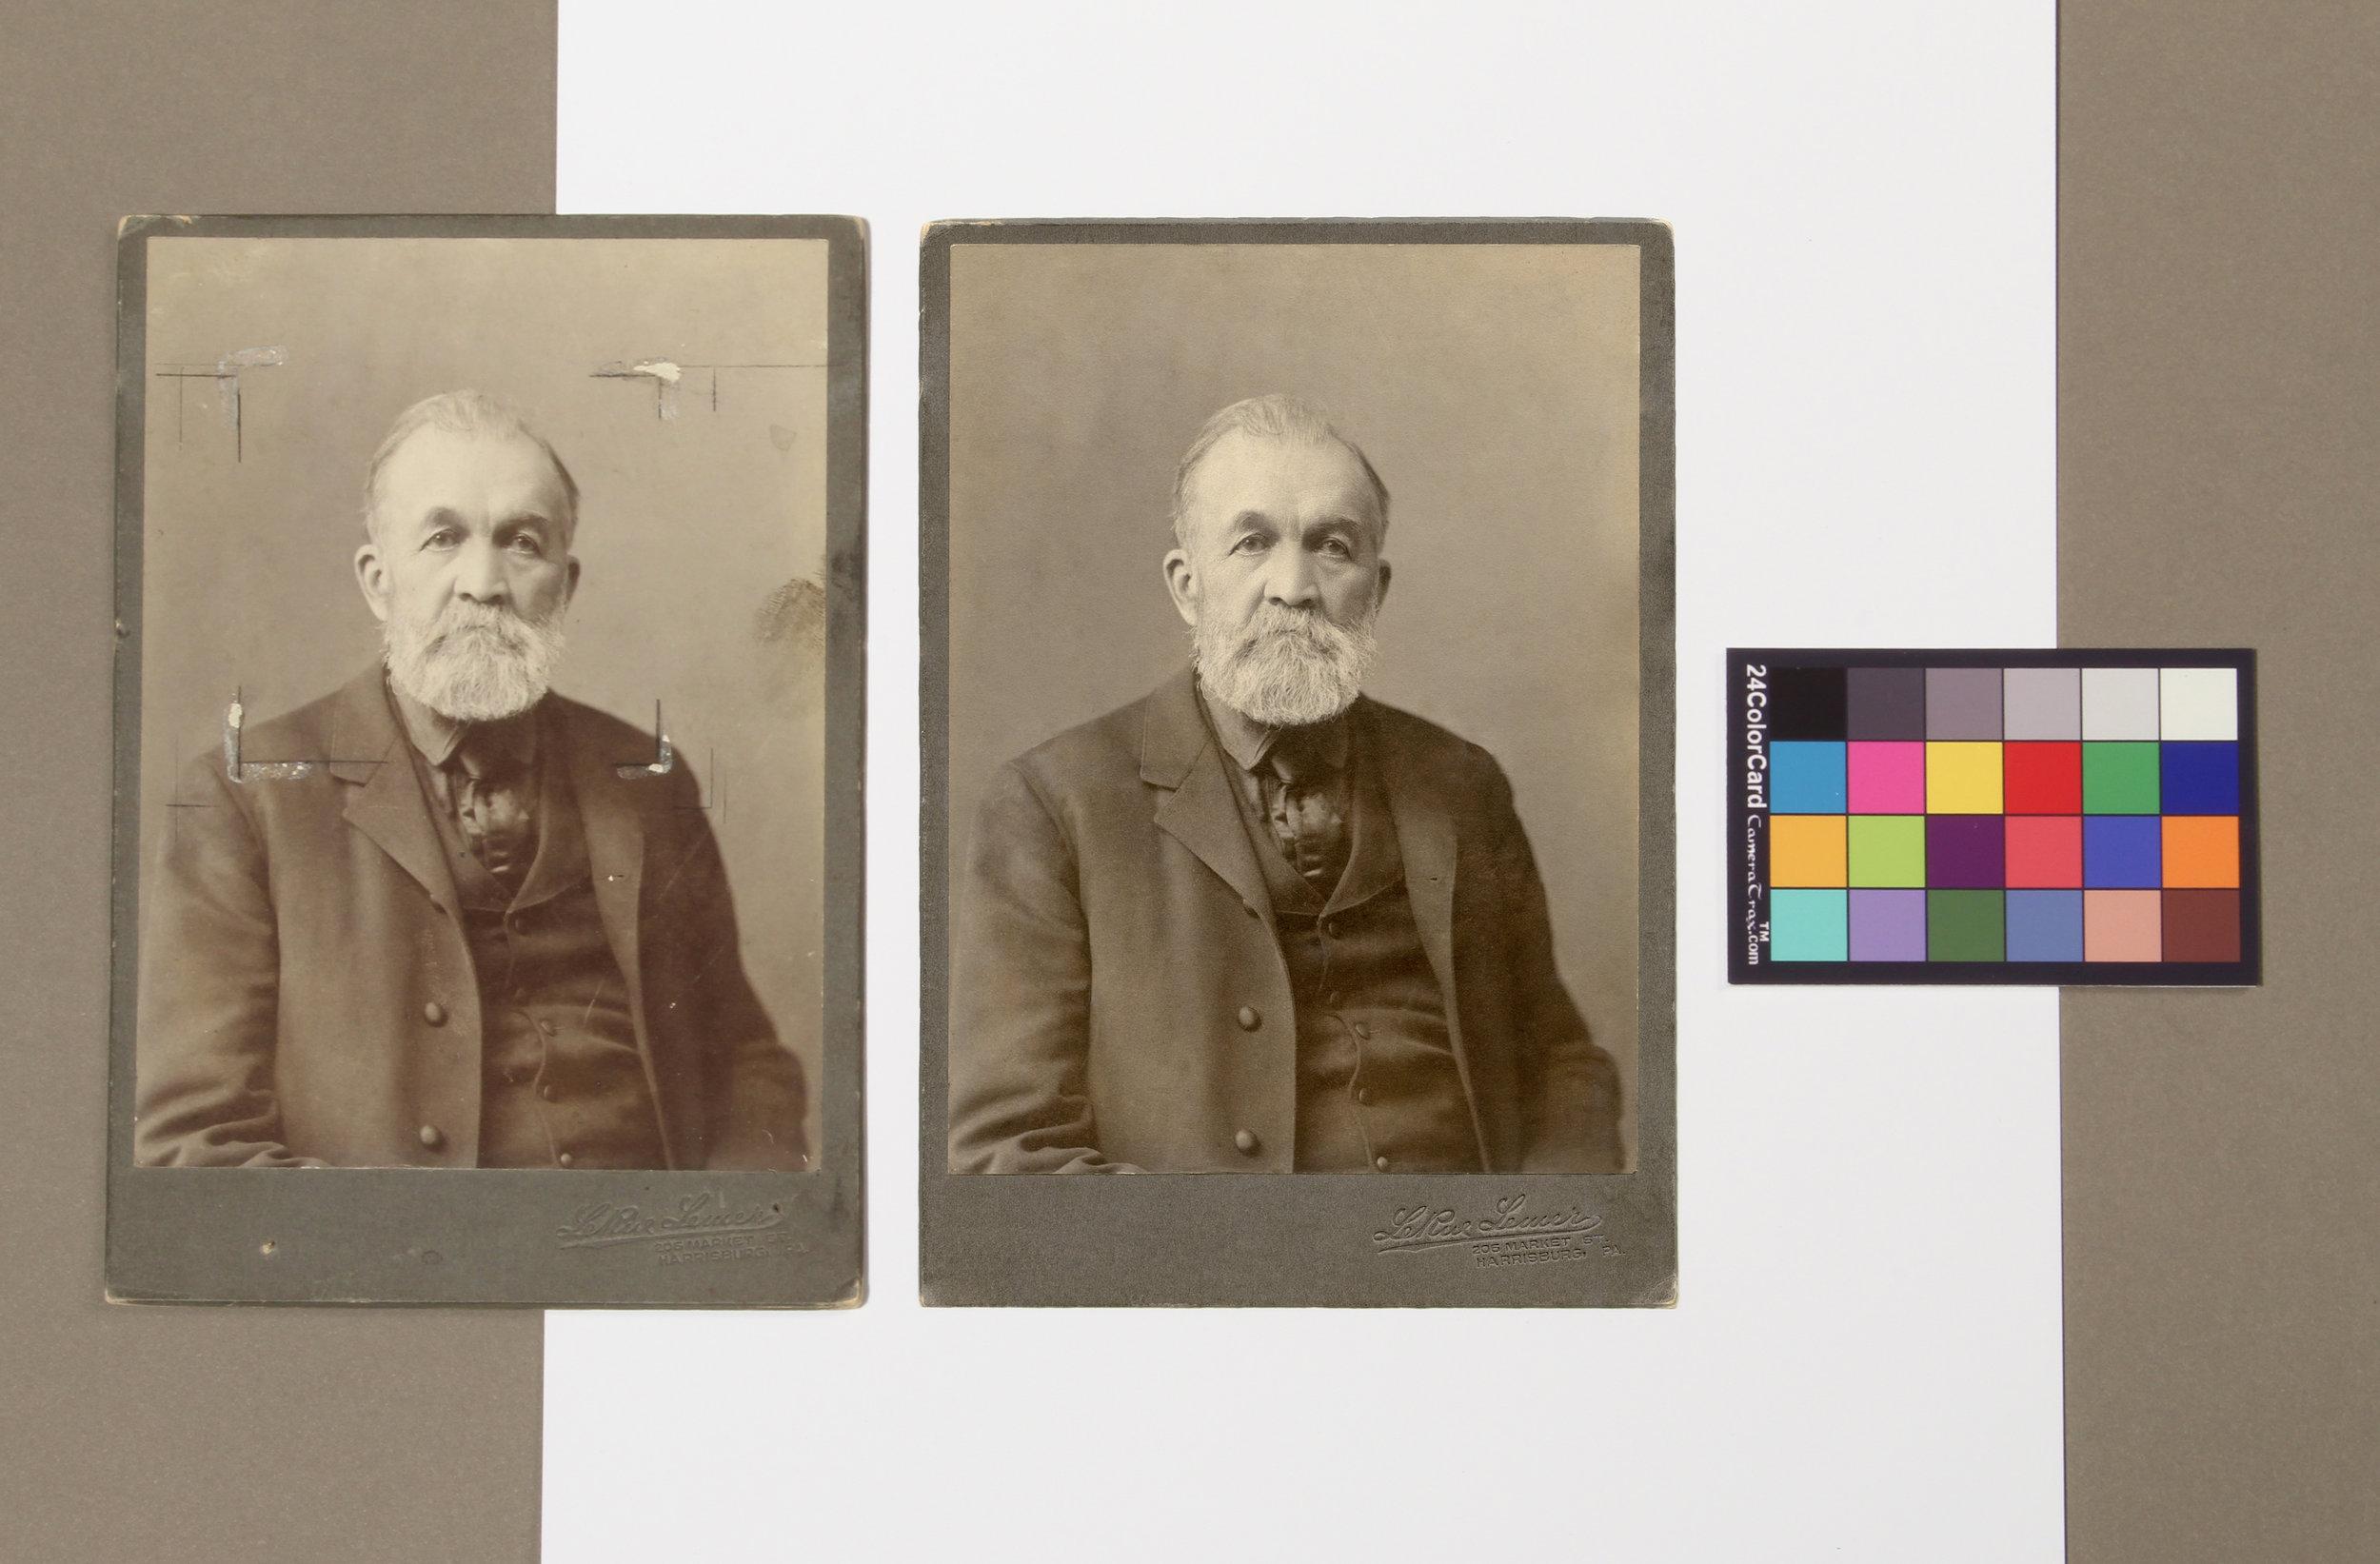 An example of American Civil War photograph digital restoration